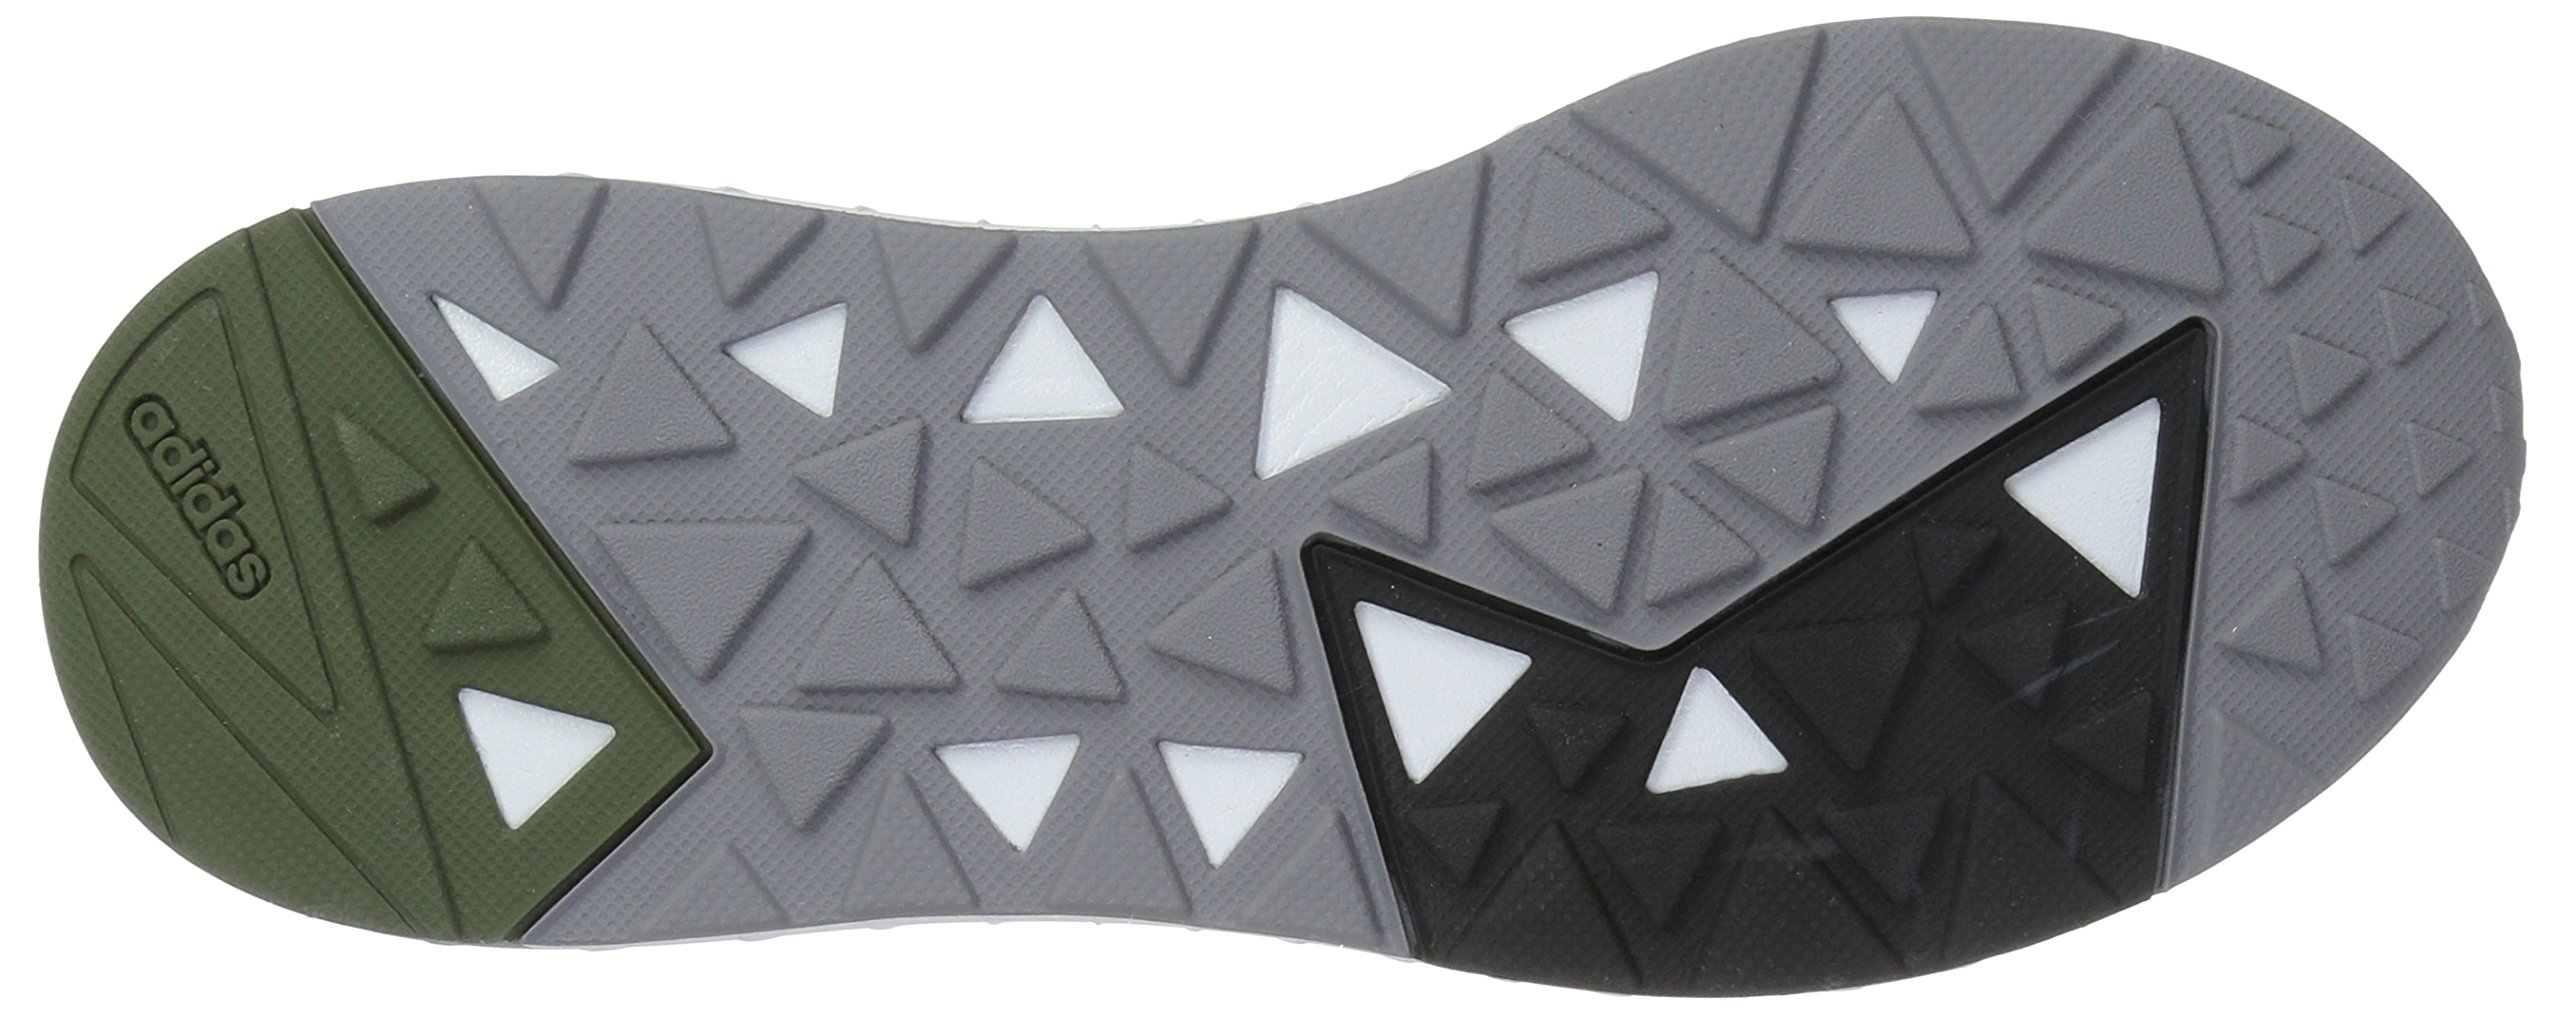 adidas Men's Questar BYD Running Shoe, Base Green/Black/Grey, 6.5 M US by adidas (Image #3)